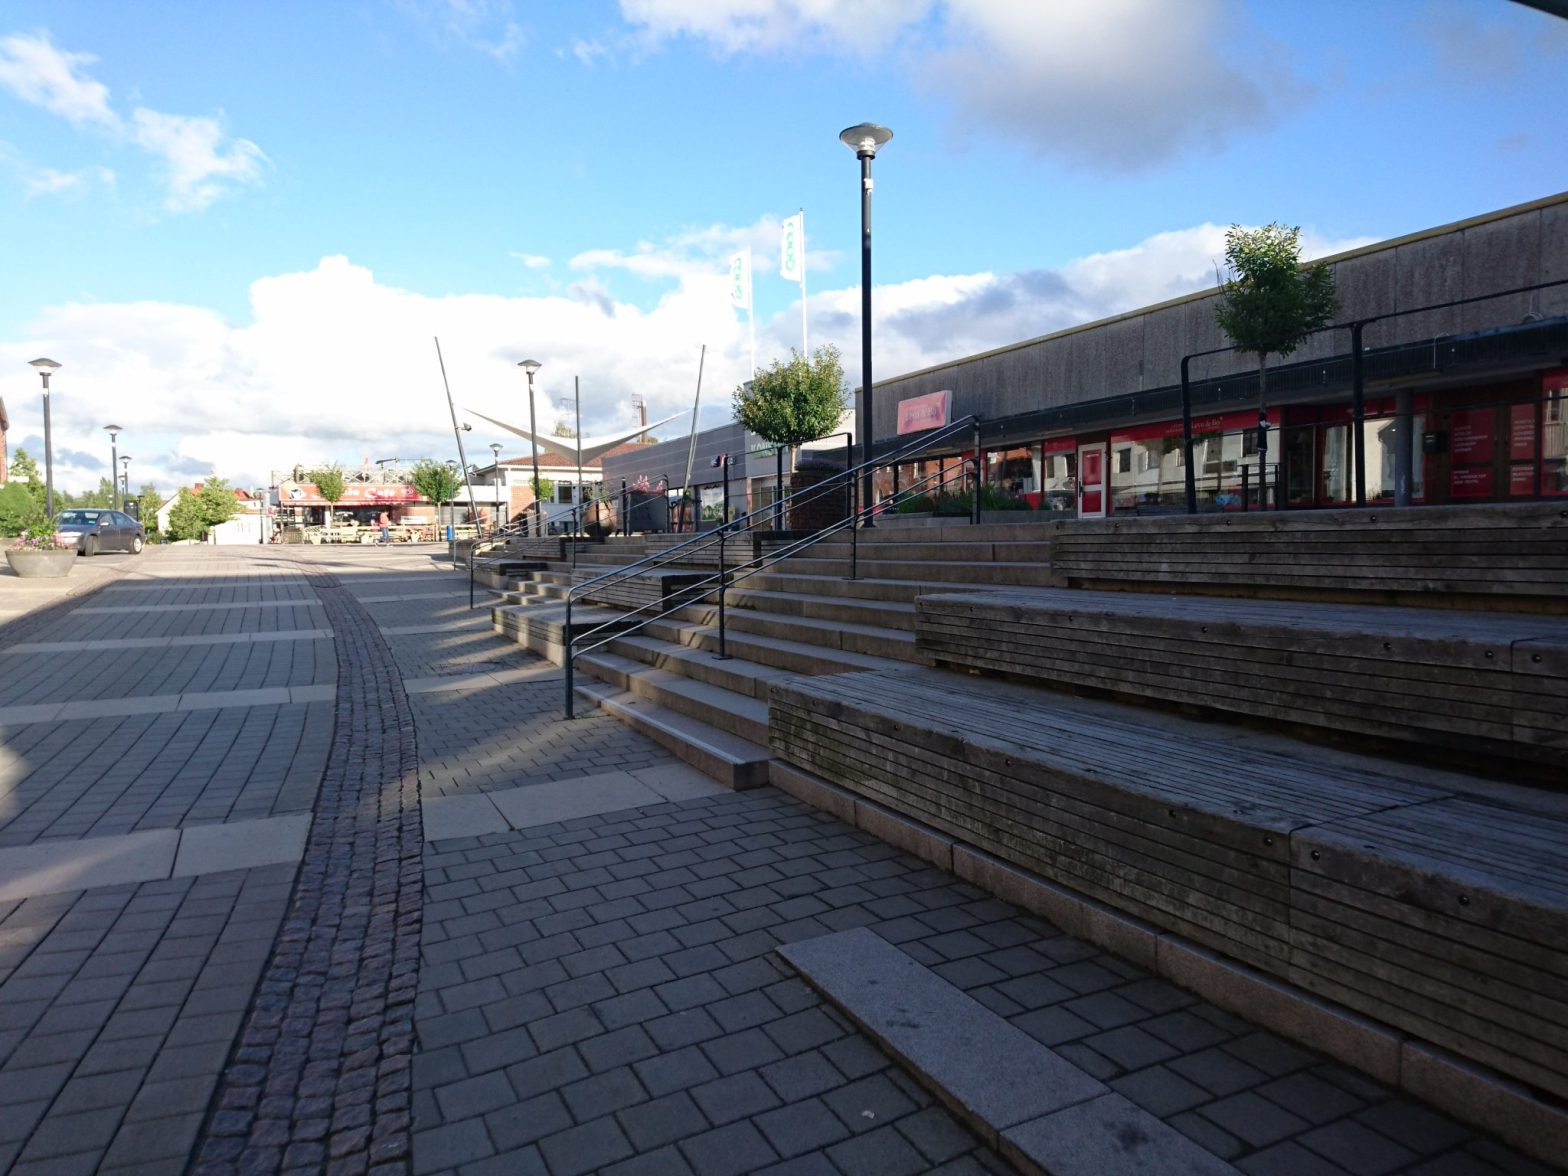 Bengtsfors centrum 2017